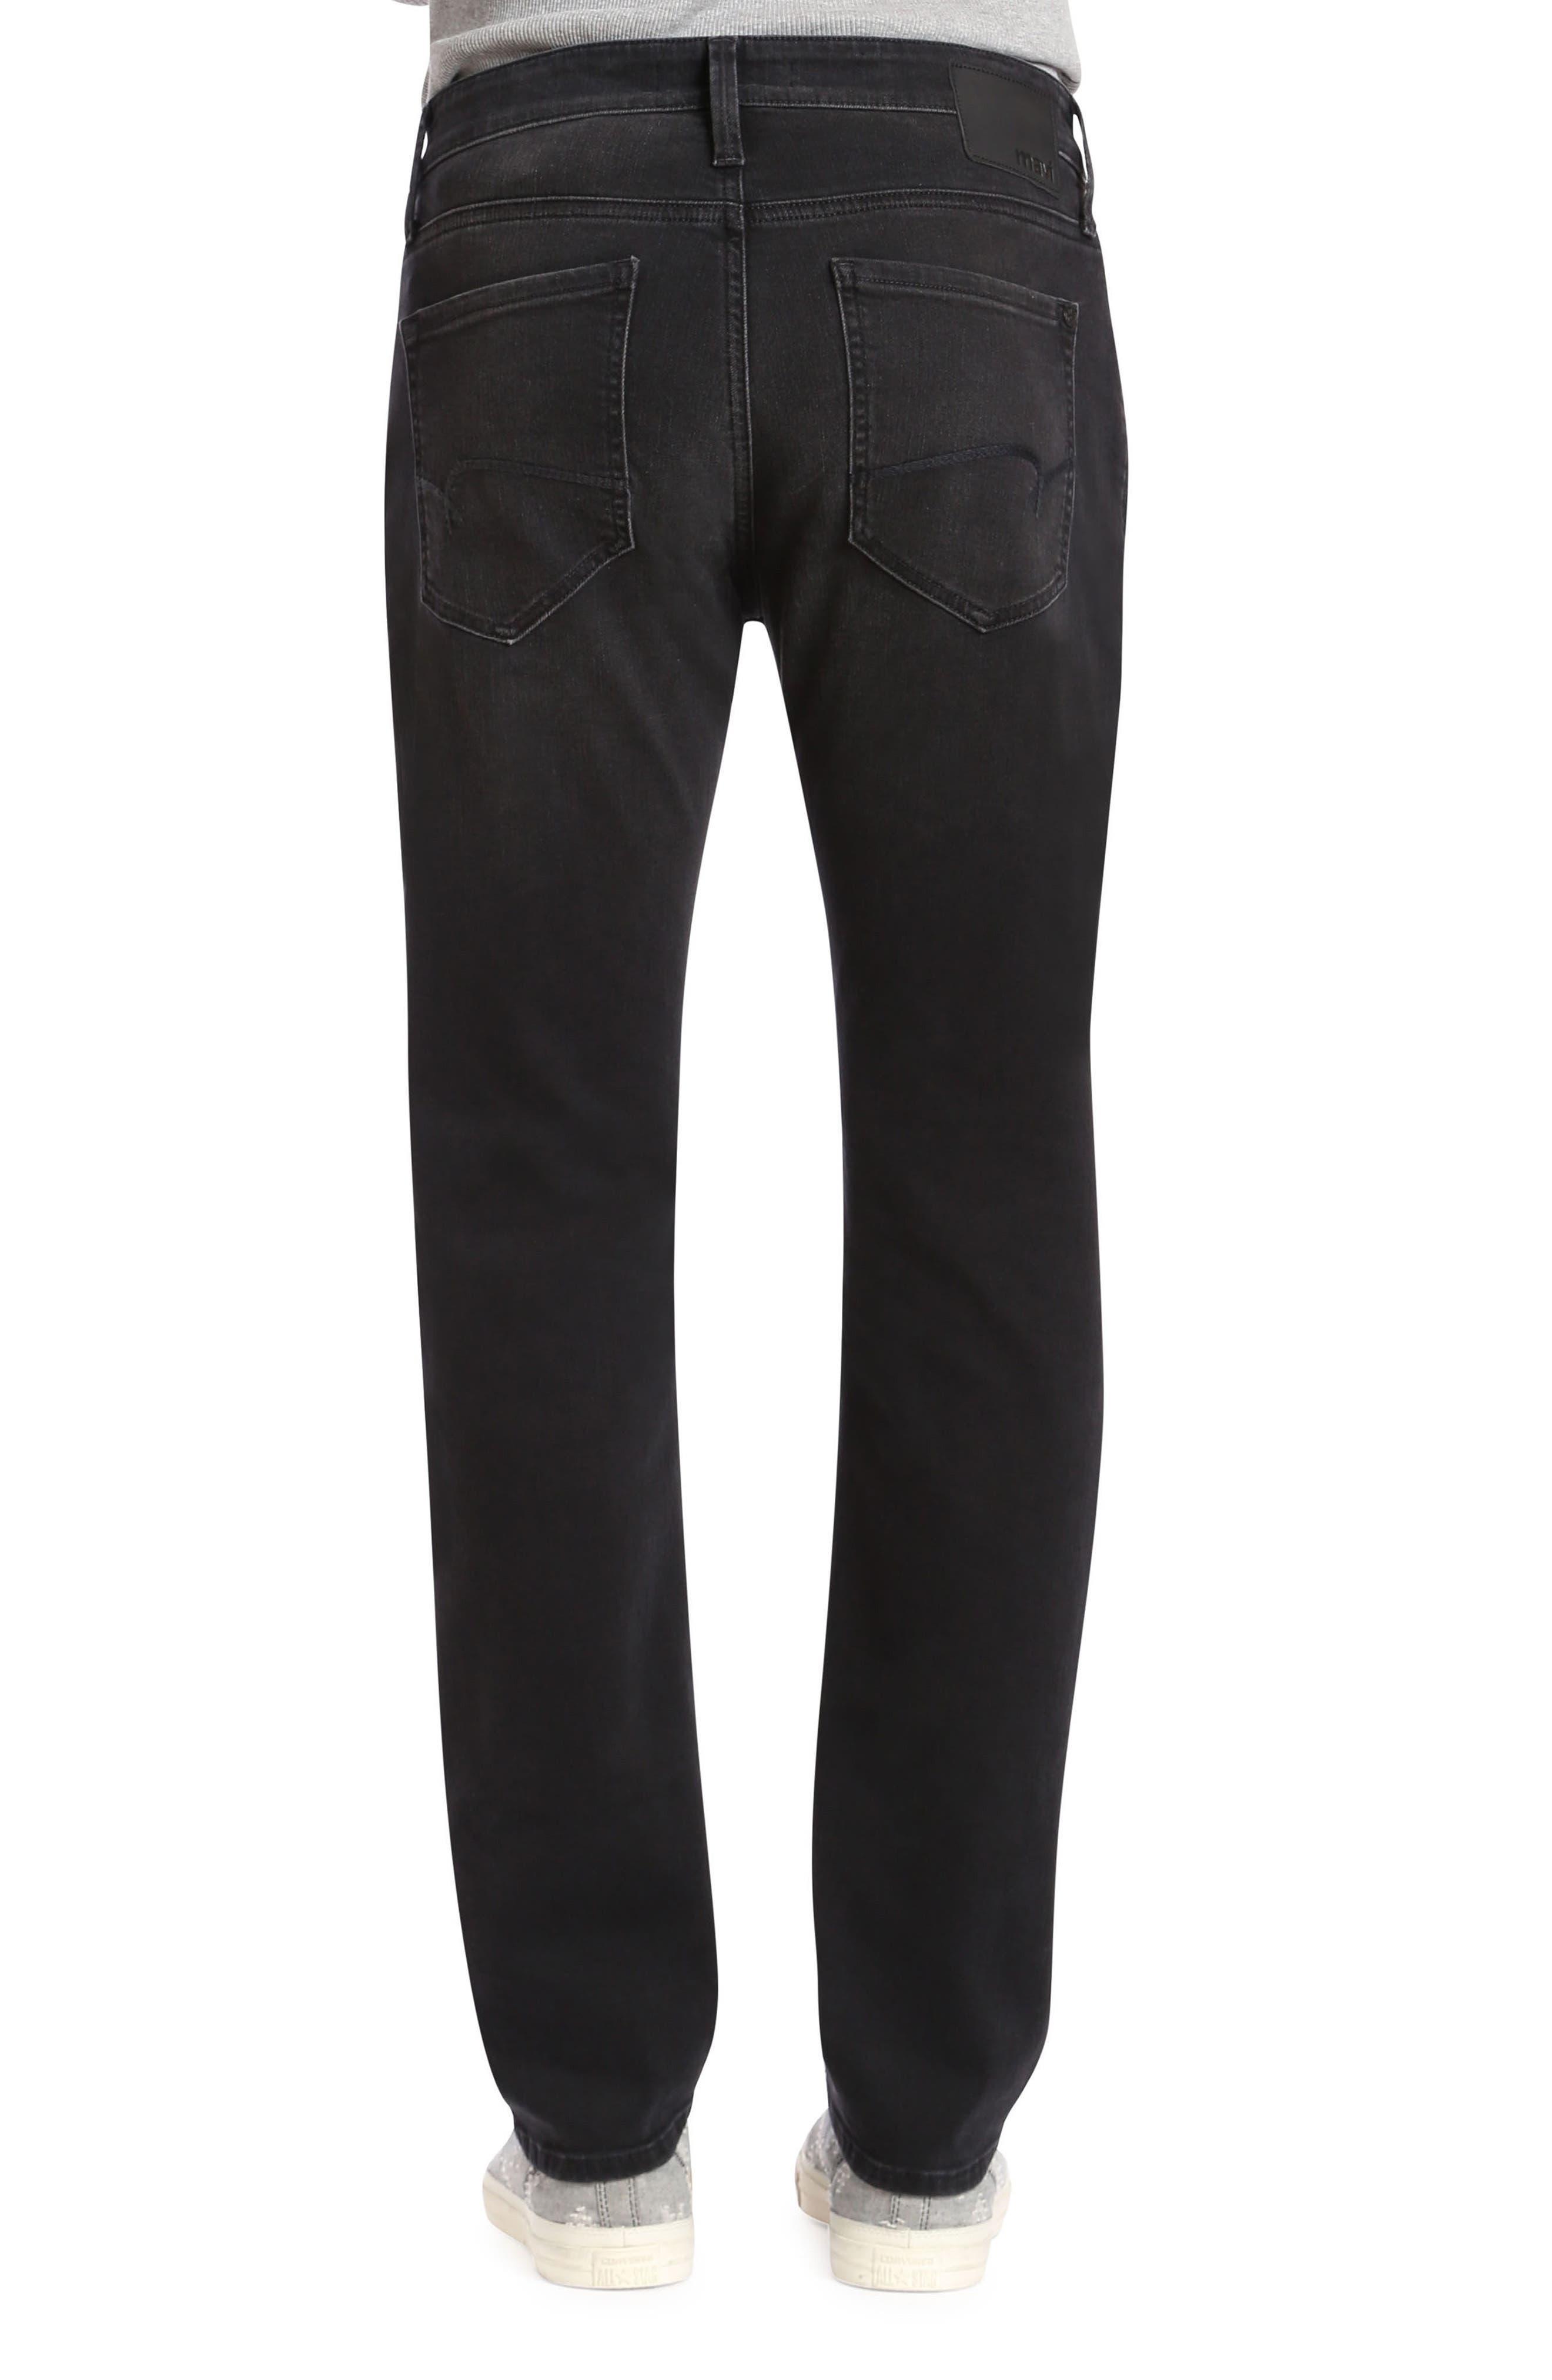 Marcus Slim Straight Leg Jeans,                             Alternate thumbnail 2, color,                             Dark Smoke Williamsburg